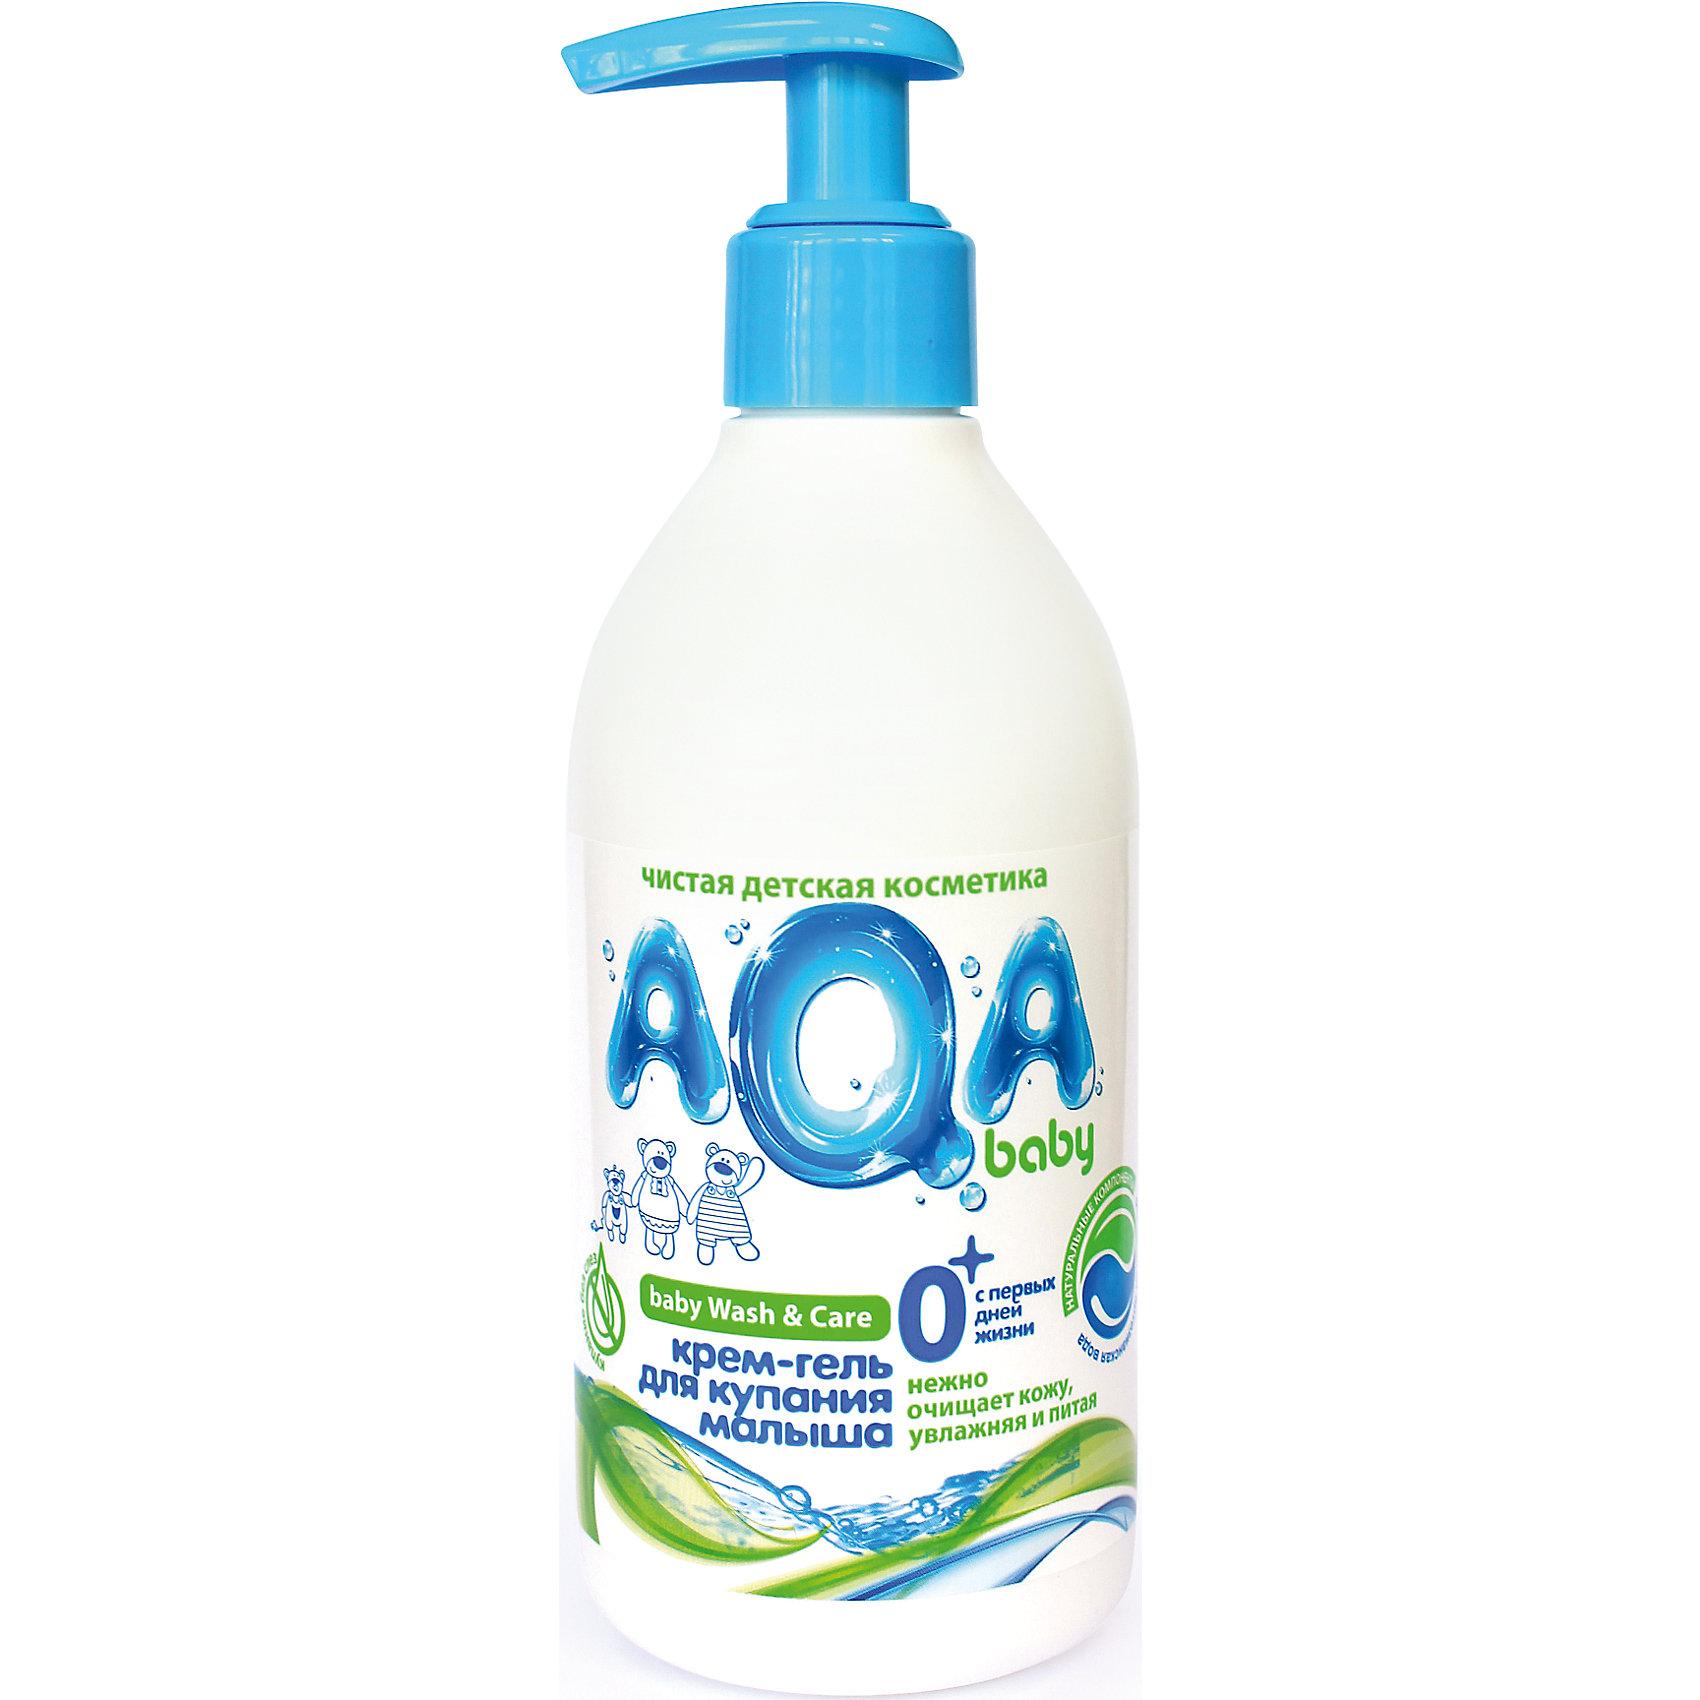 ����-���� ��� ������� ������, AQA baby, 300 ��.